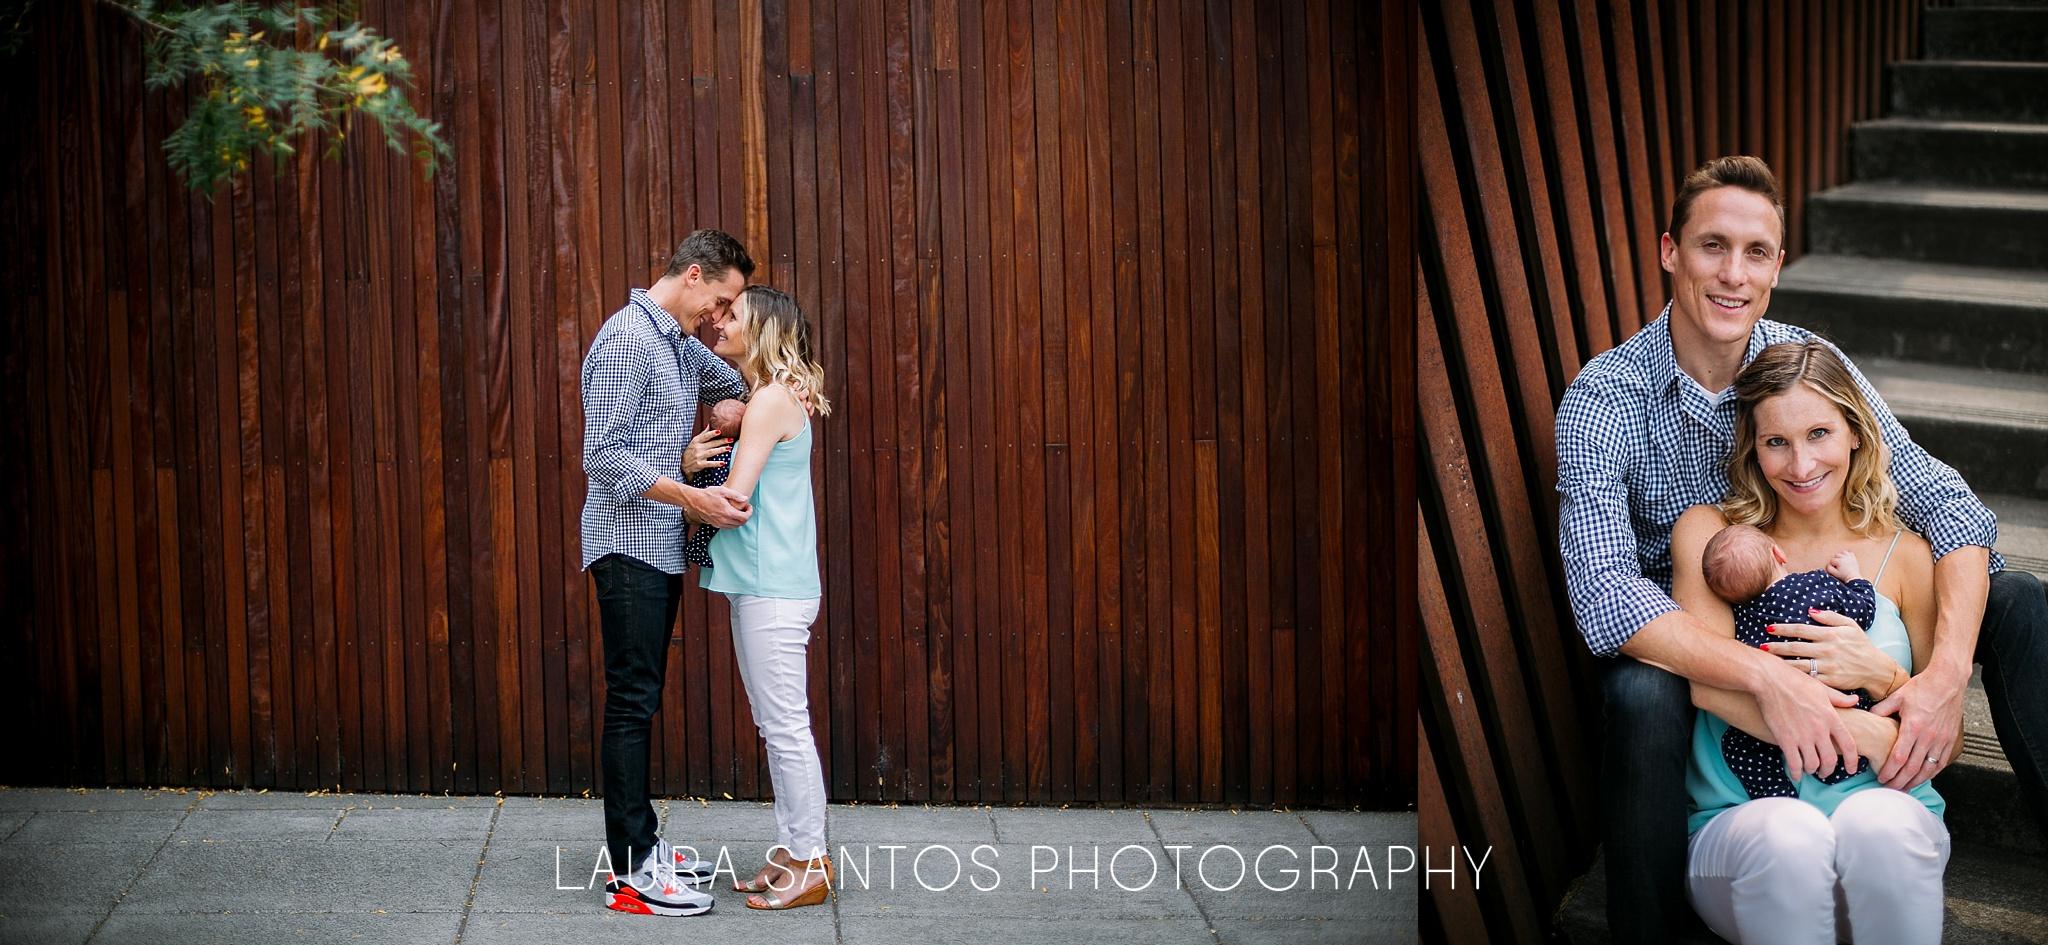 Laura Santos Photography Portland Oregon Family Photographer_0283.jpg